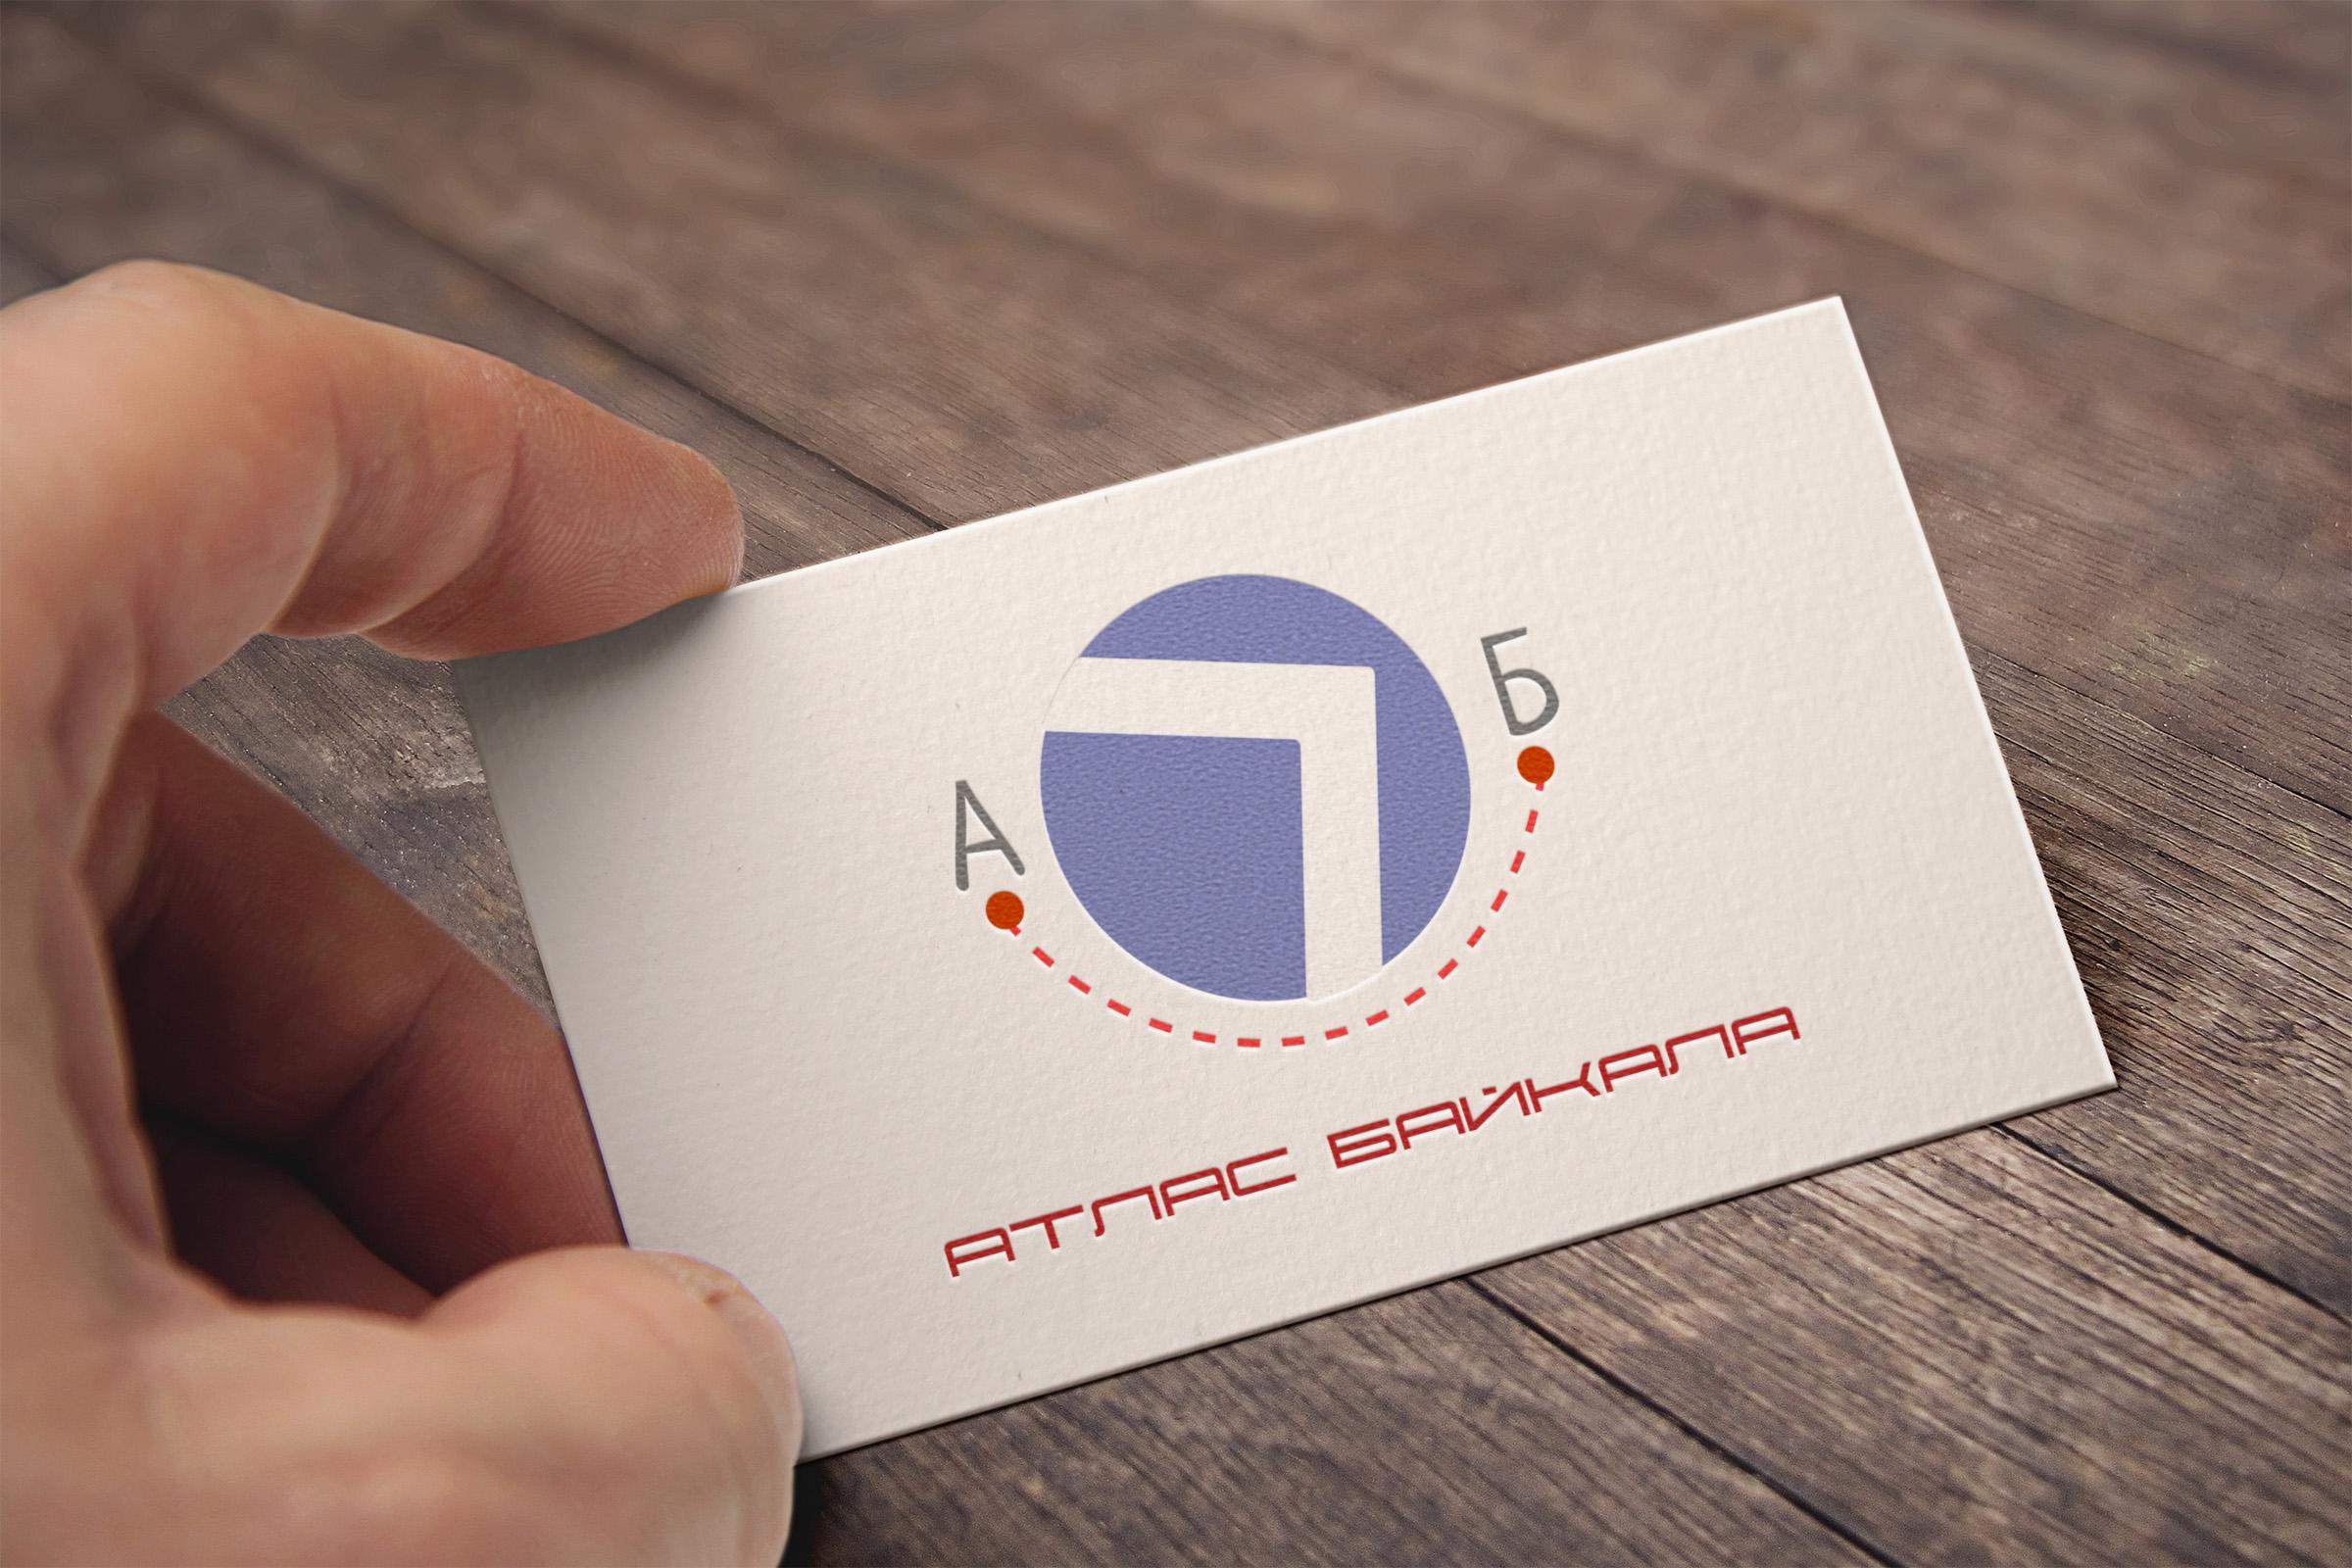 Разработка логотипа Атлас Байкала фото f_8265b0196e7e9baa.jpg